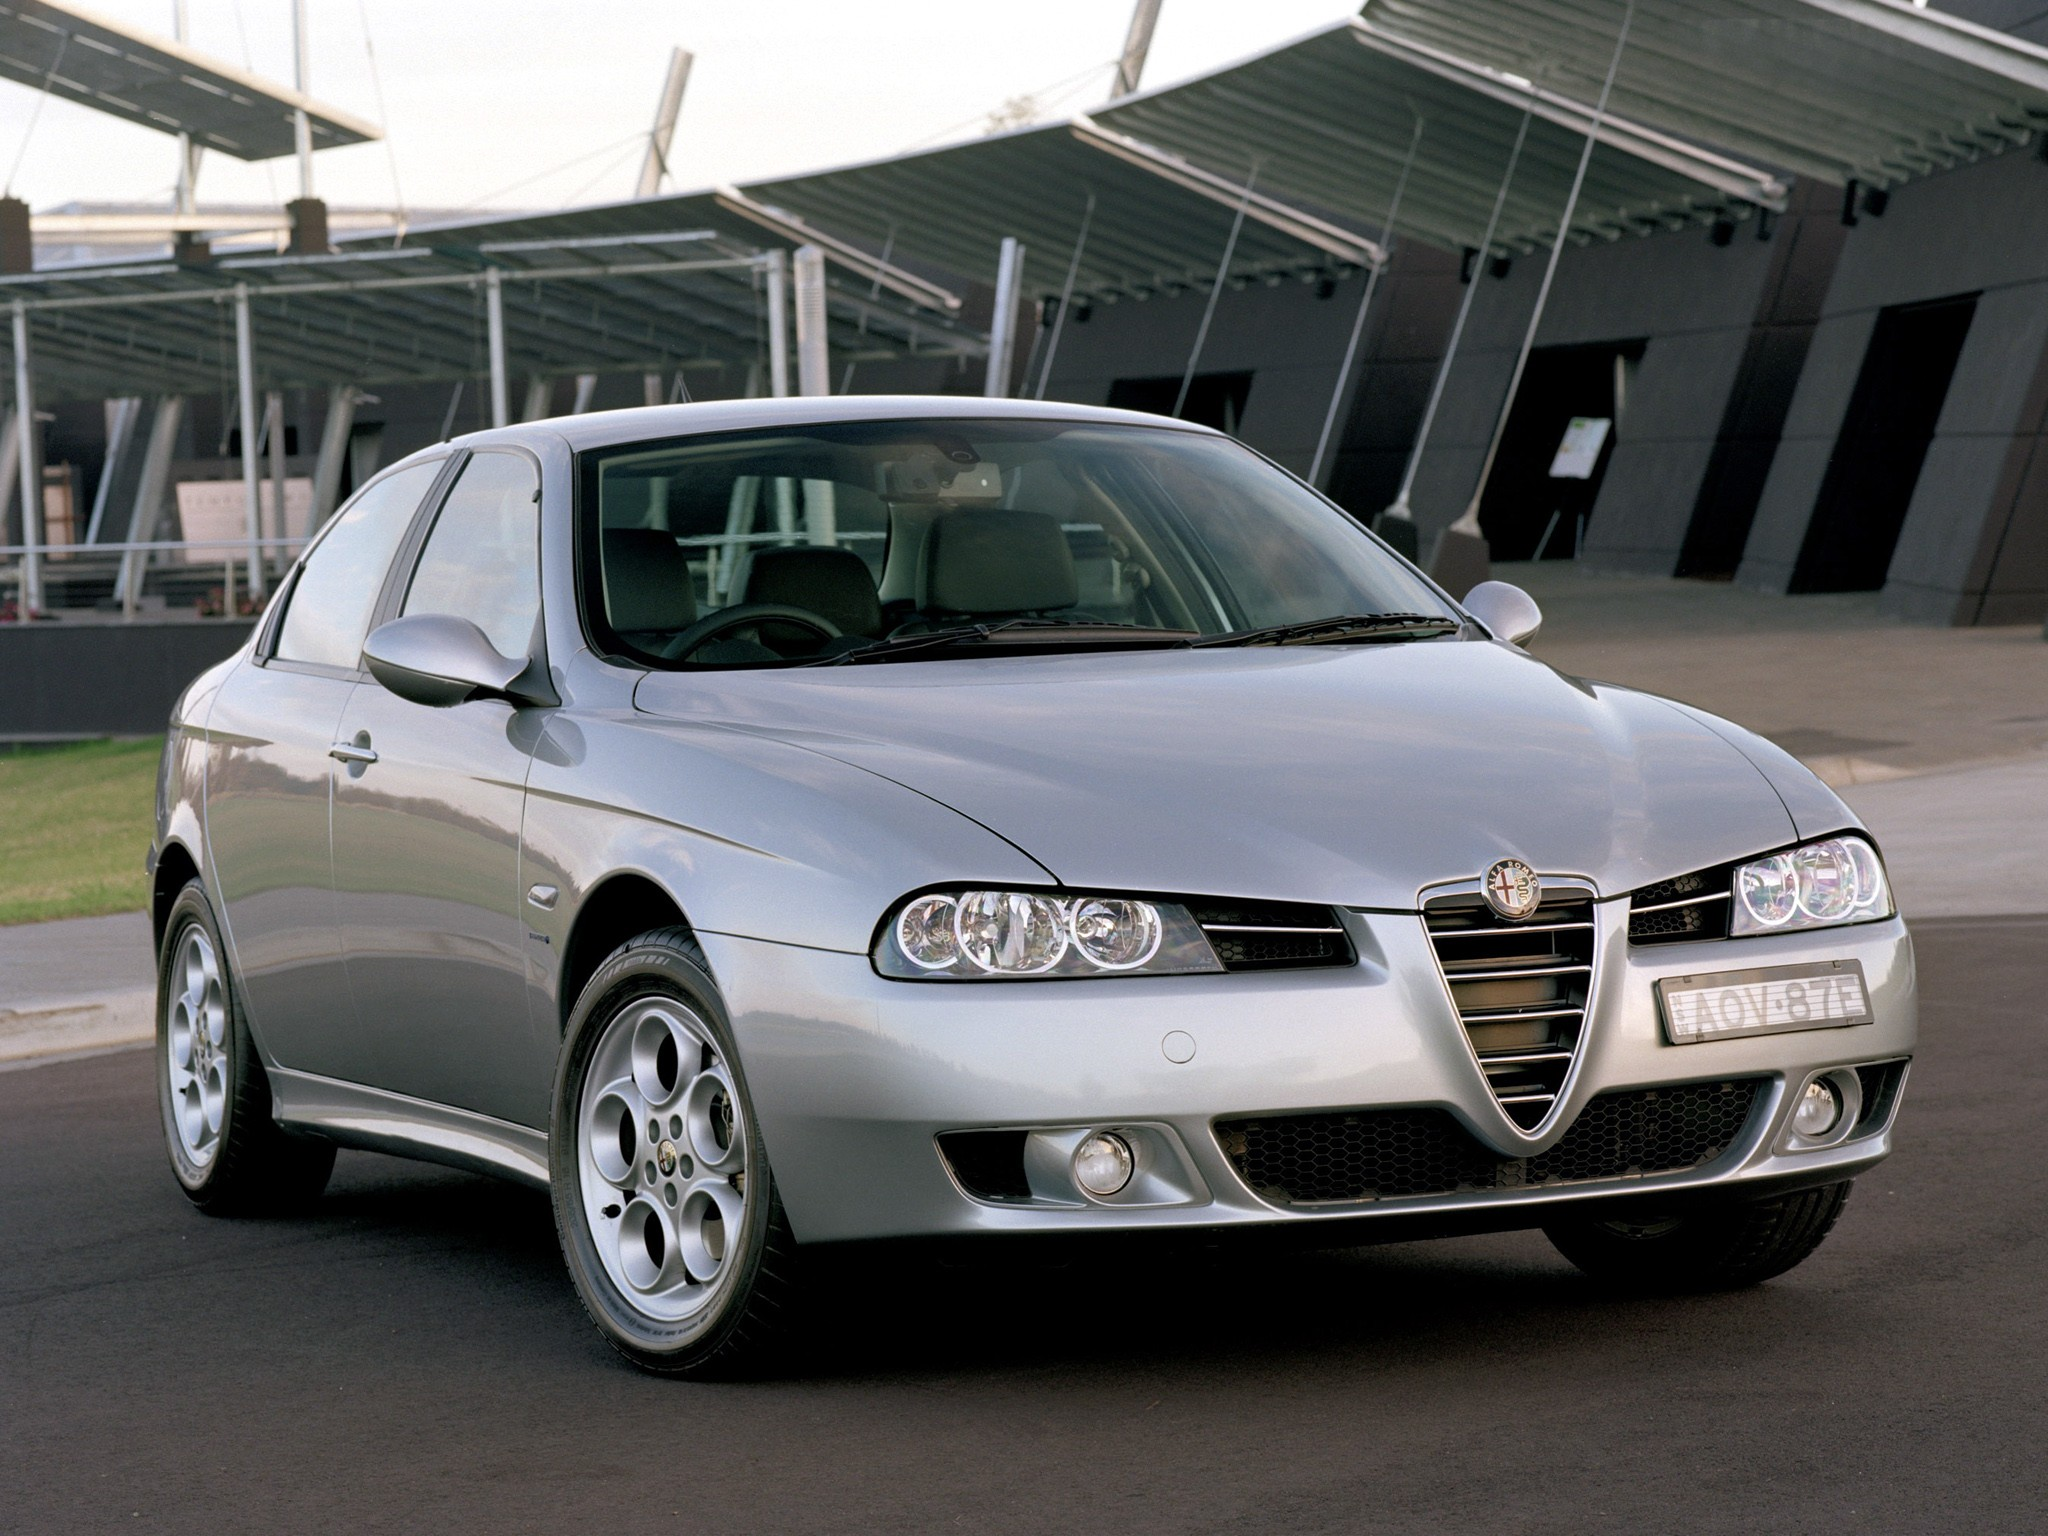 ... ALFA ROMEO 156 (2003 - 2005) ...